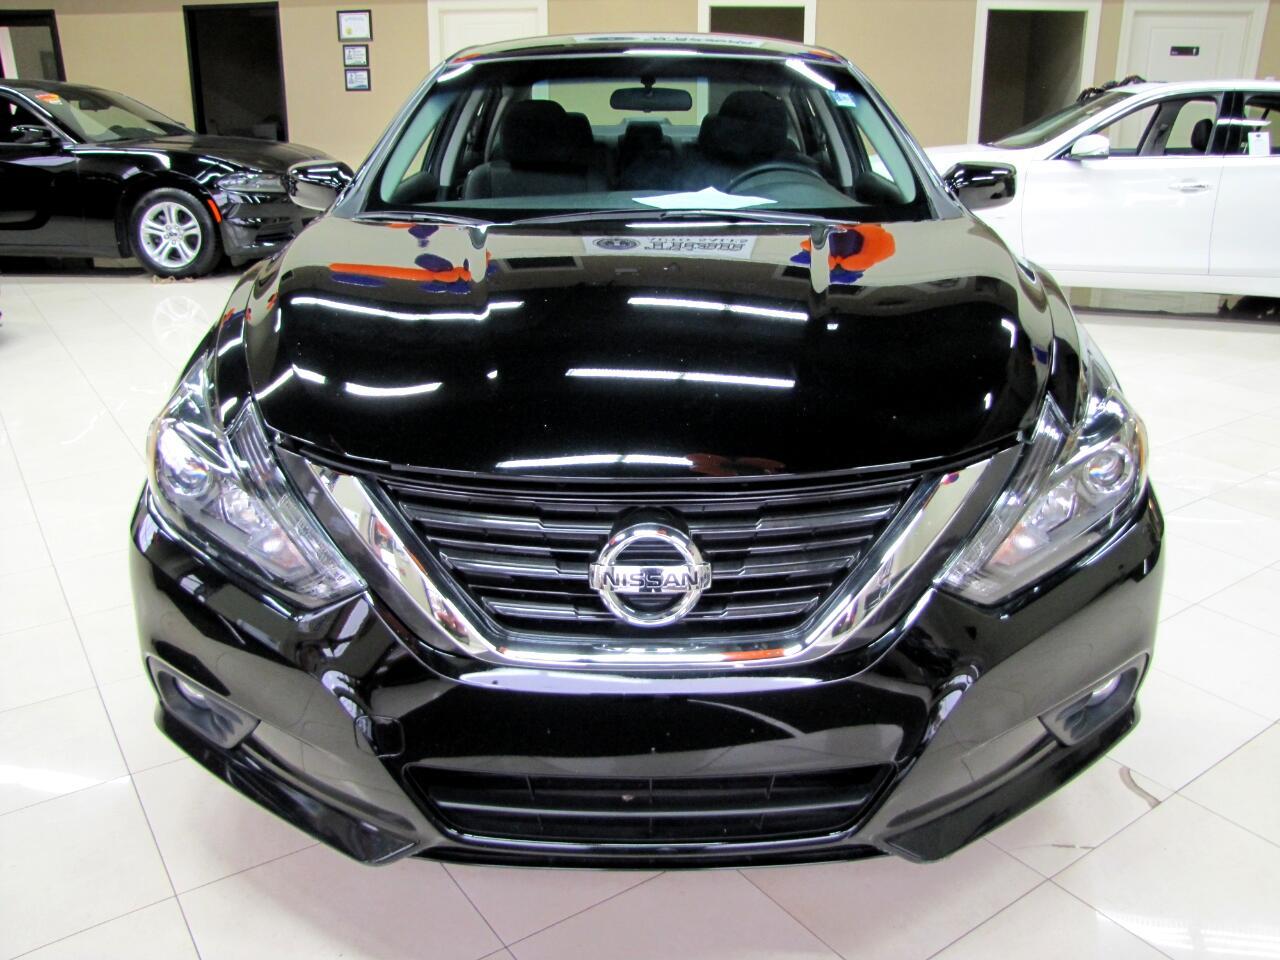 2017 Nissan Altima SR